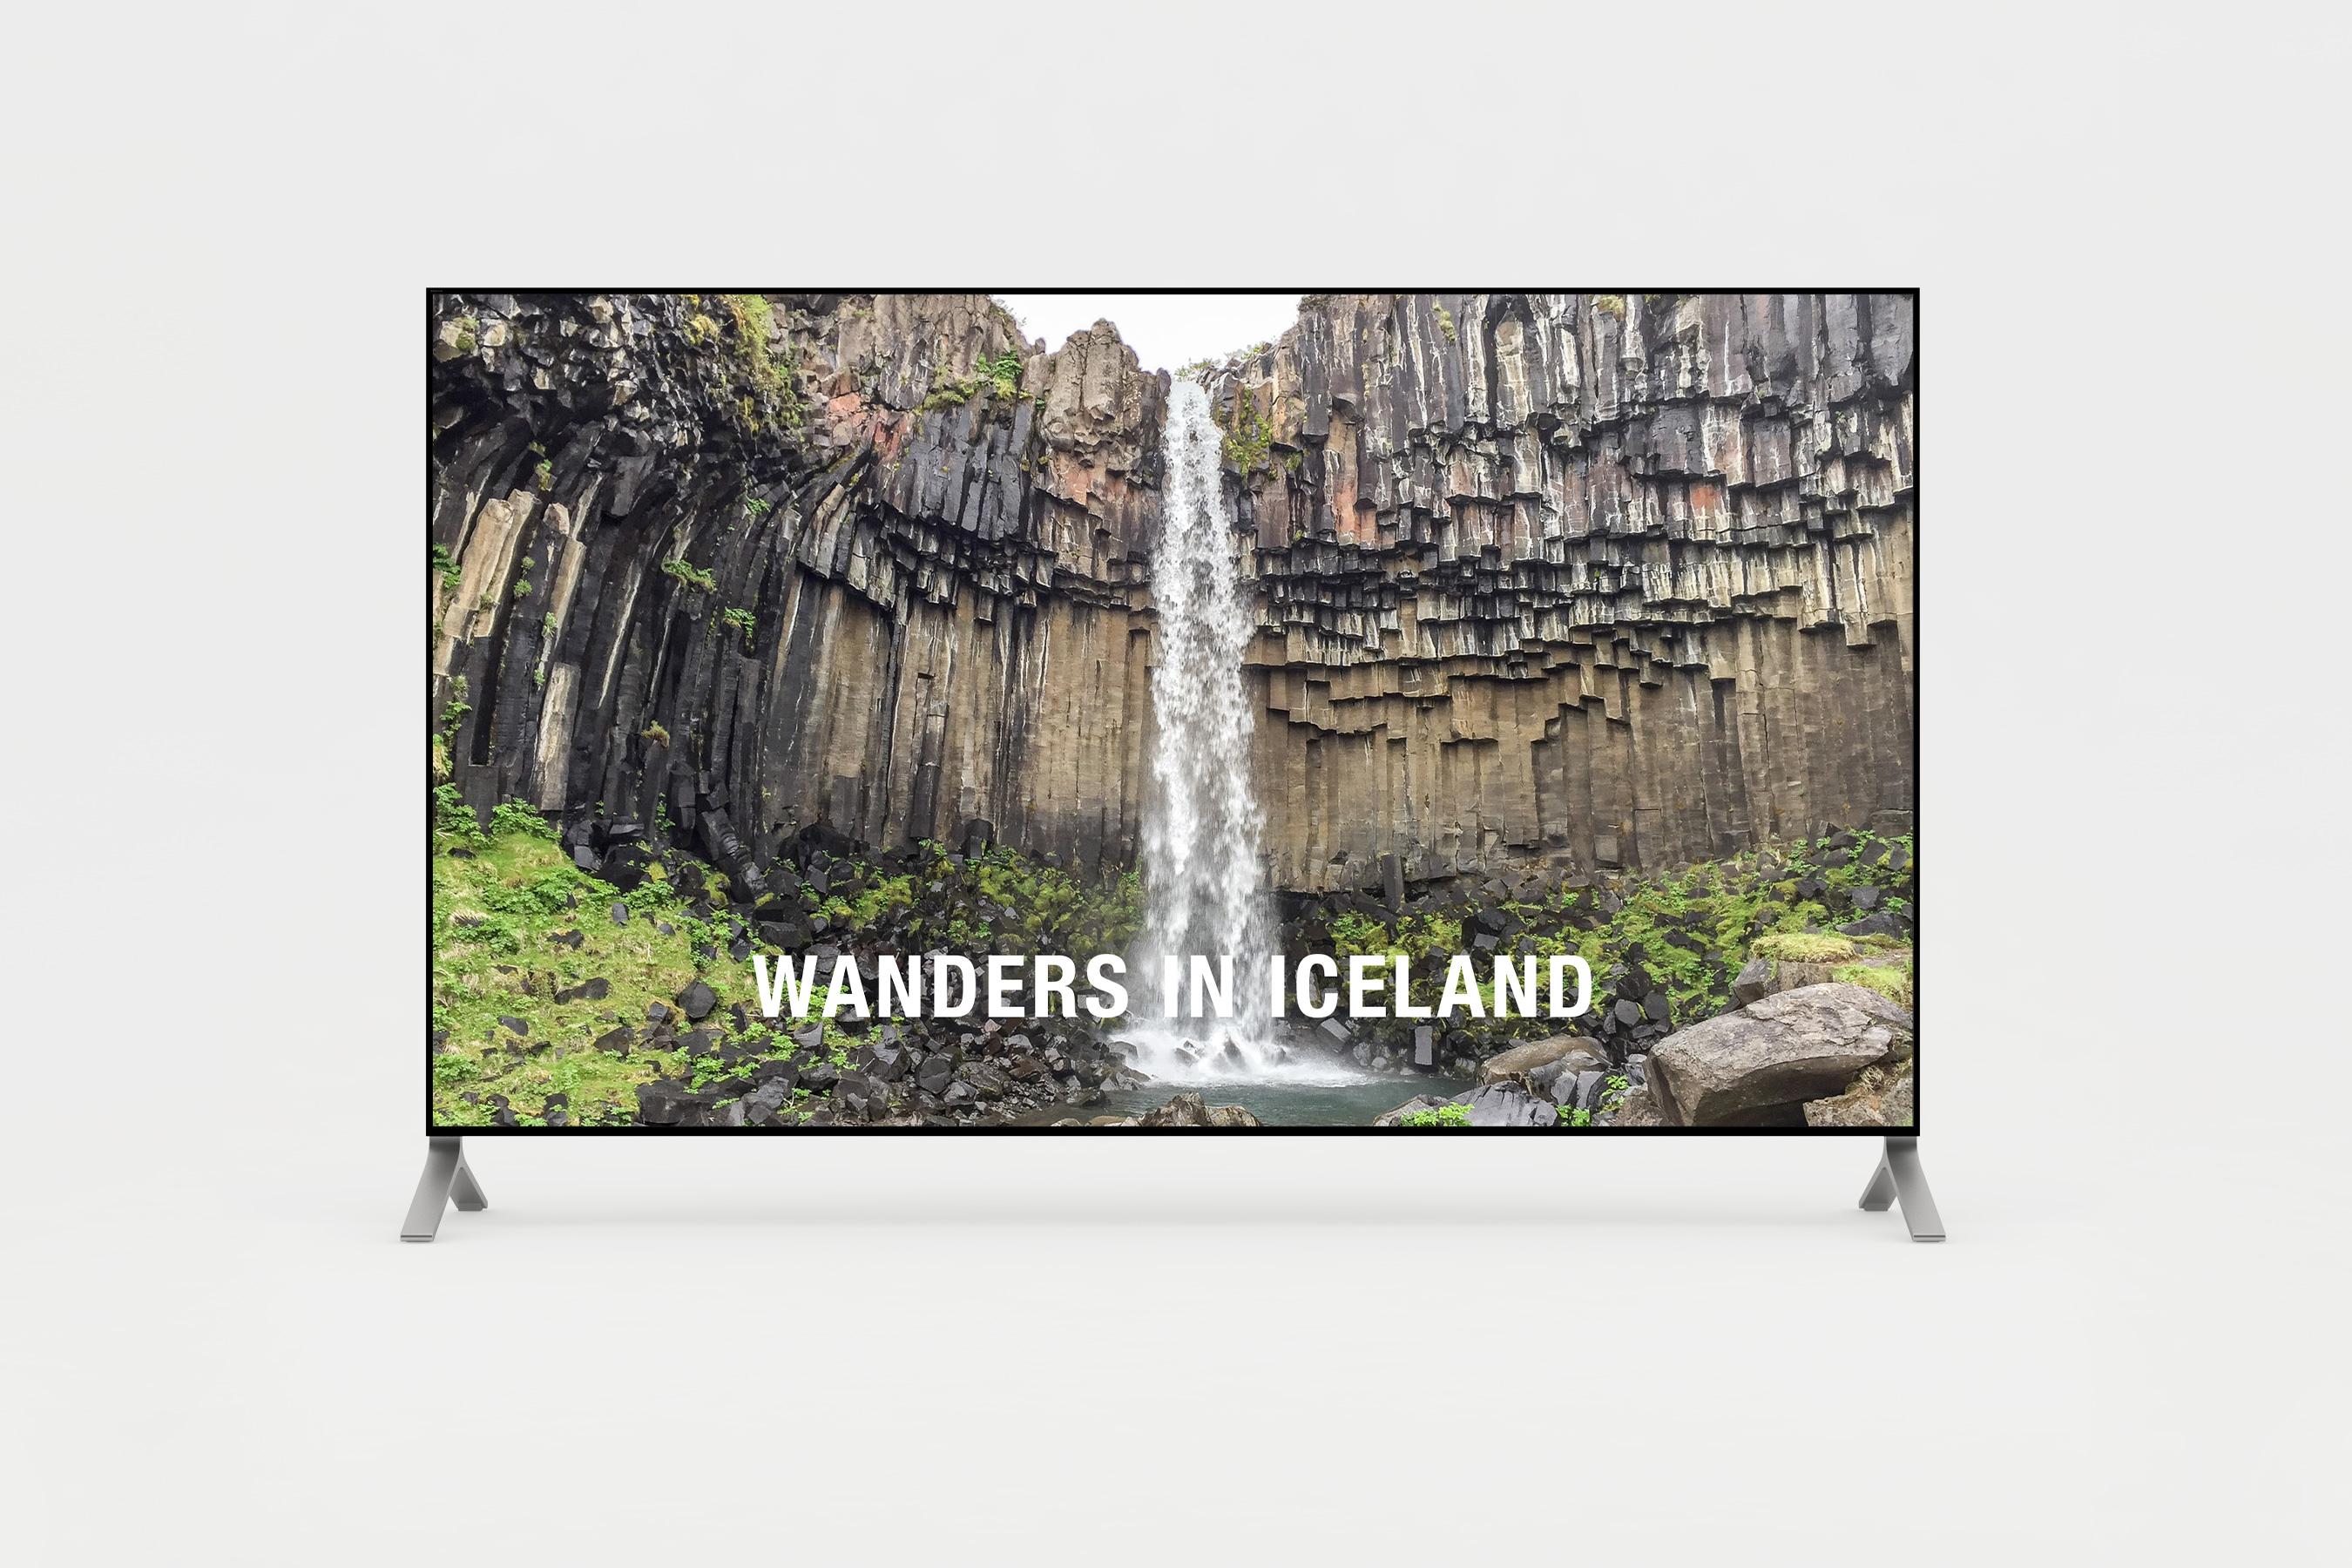 Short film of wanders in Iceland